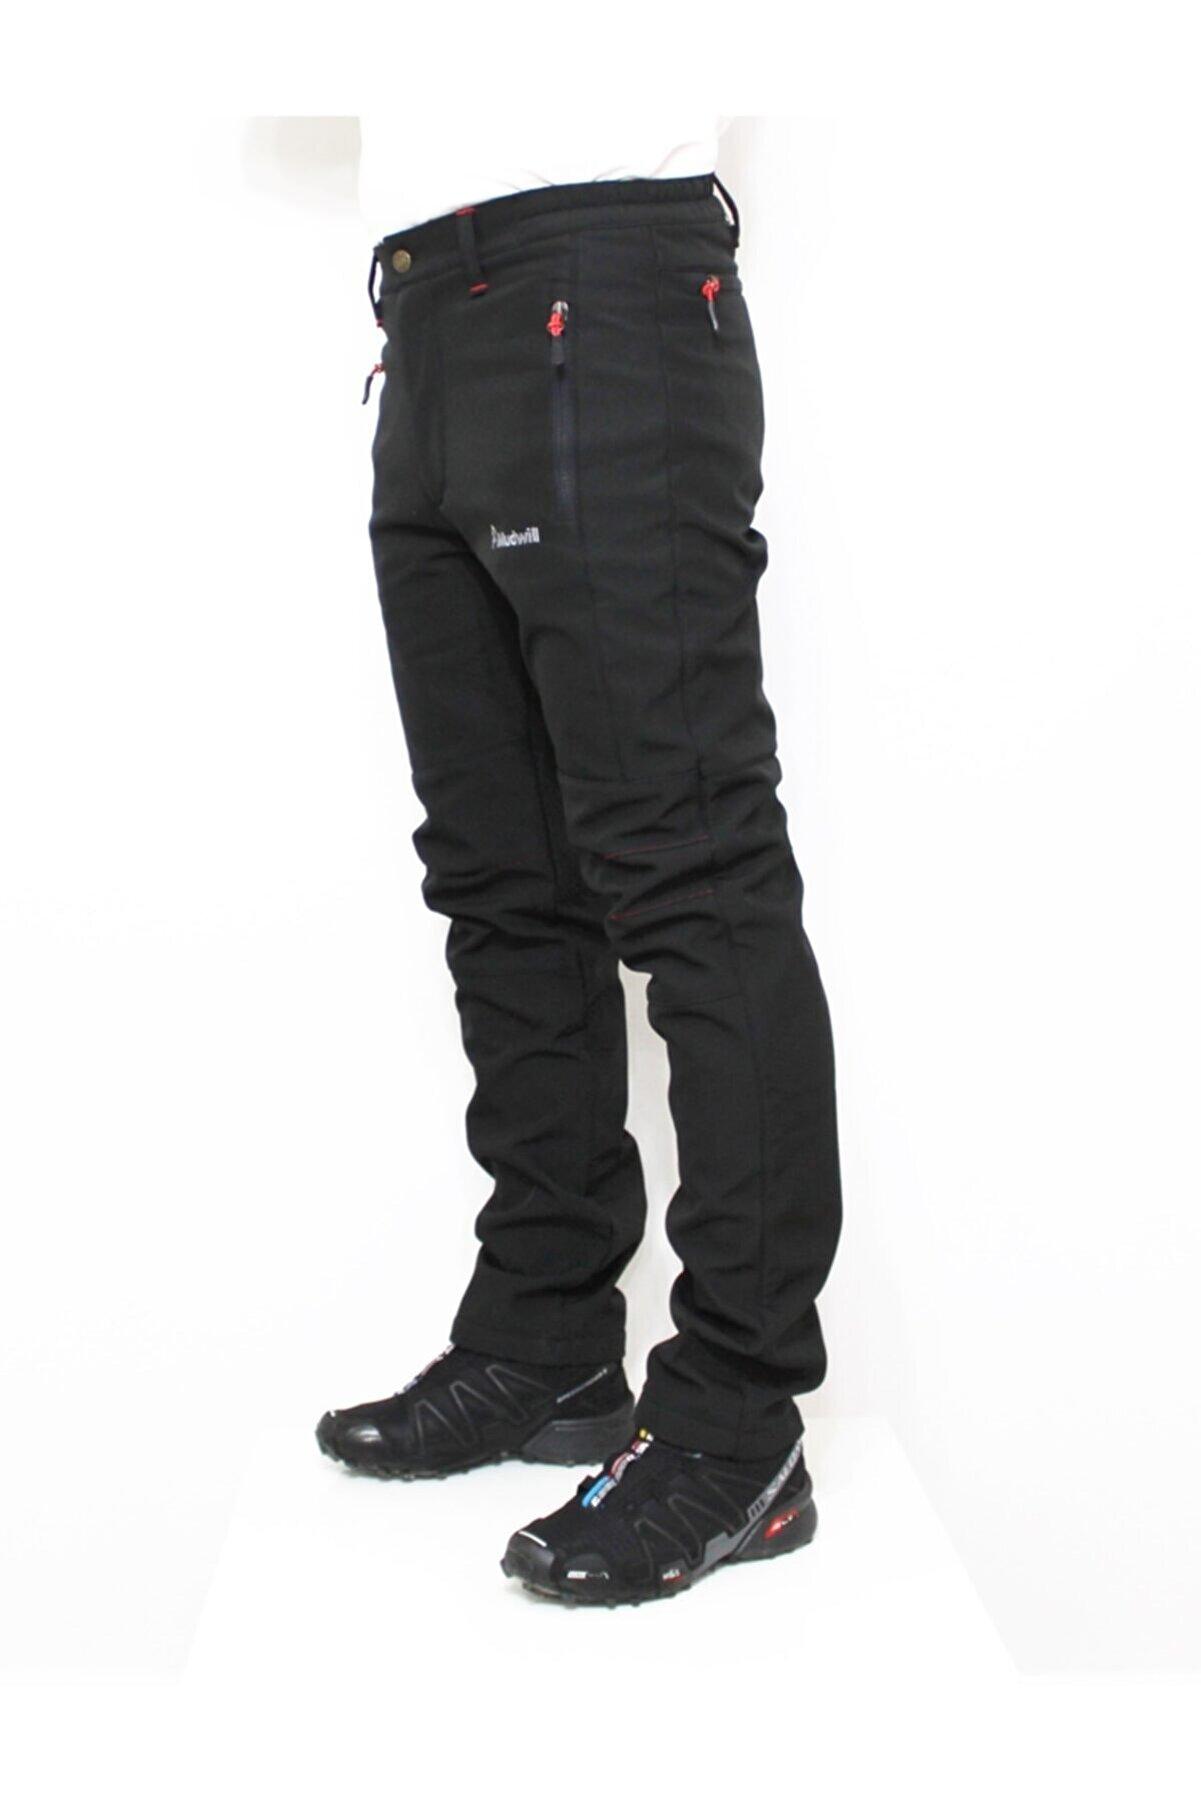 Mudwill Outdoor Kışlık Softshell Erkek Pantolon